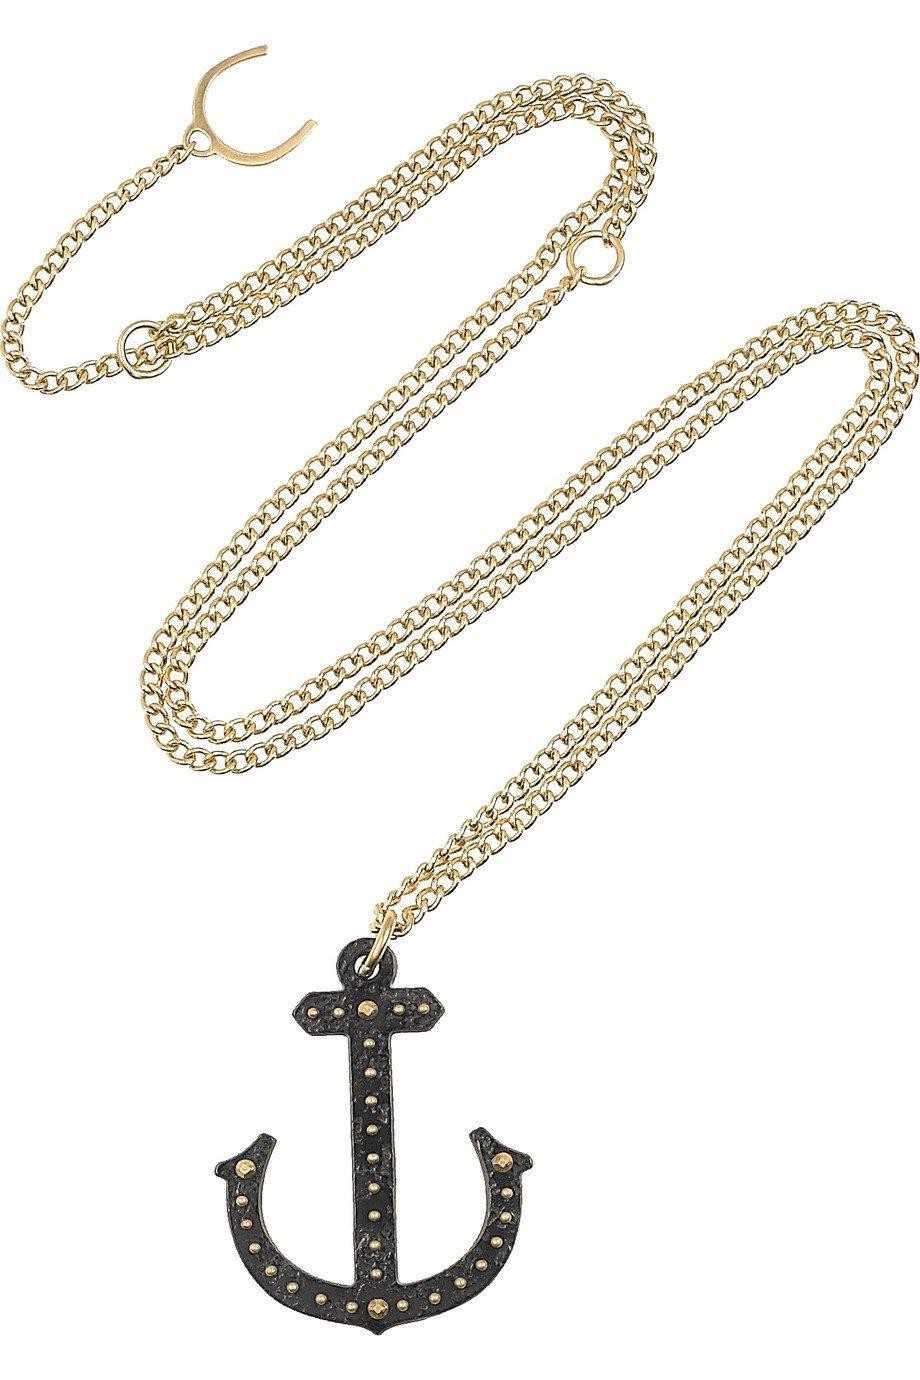 Philip Crangi Alber Anchor 14karat Gold And Blackened Steel Necklace